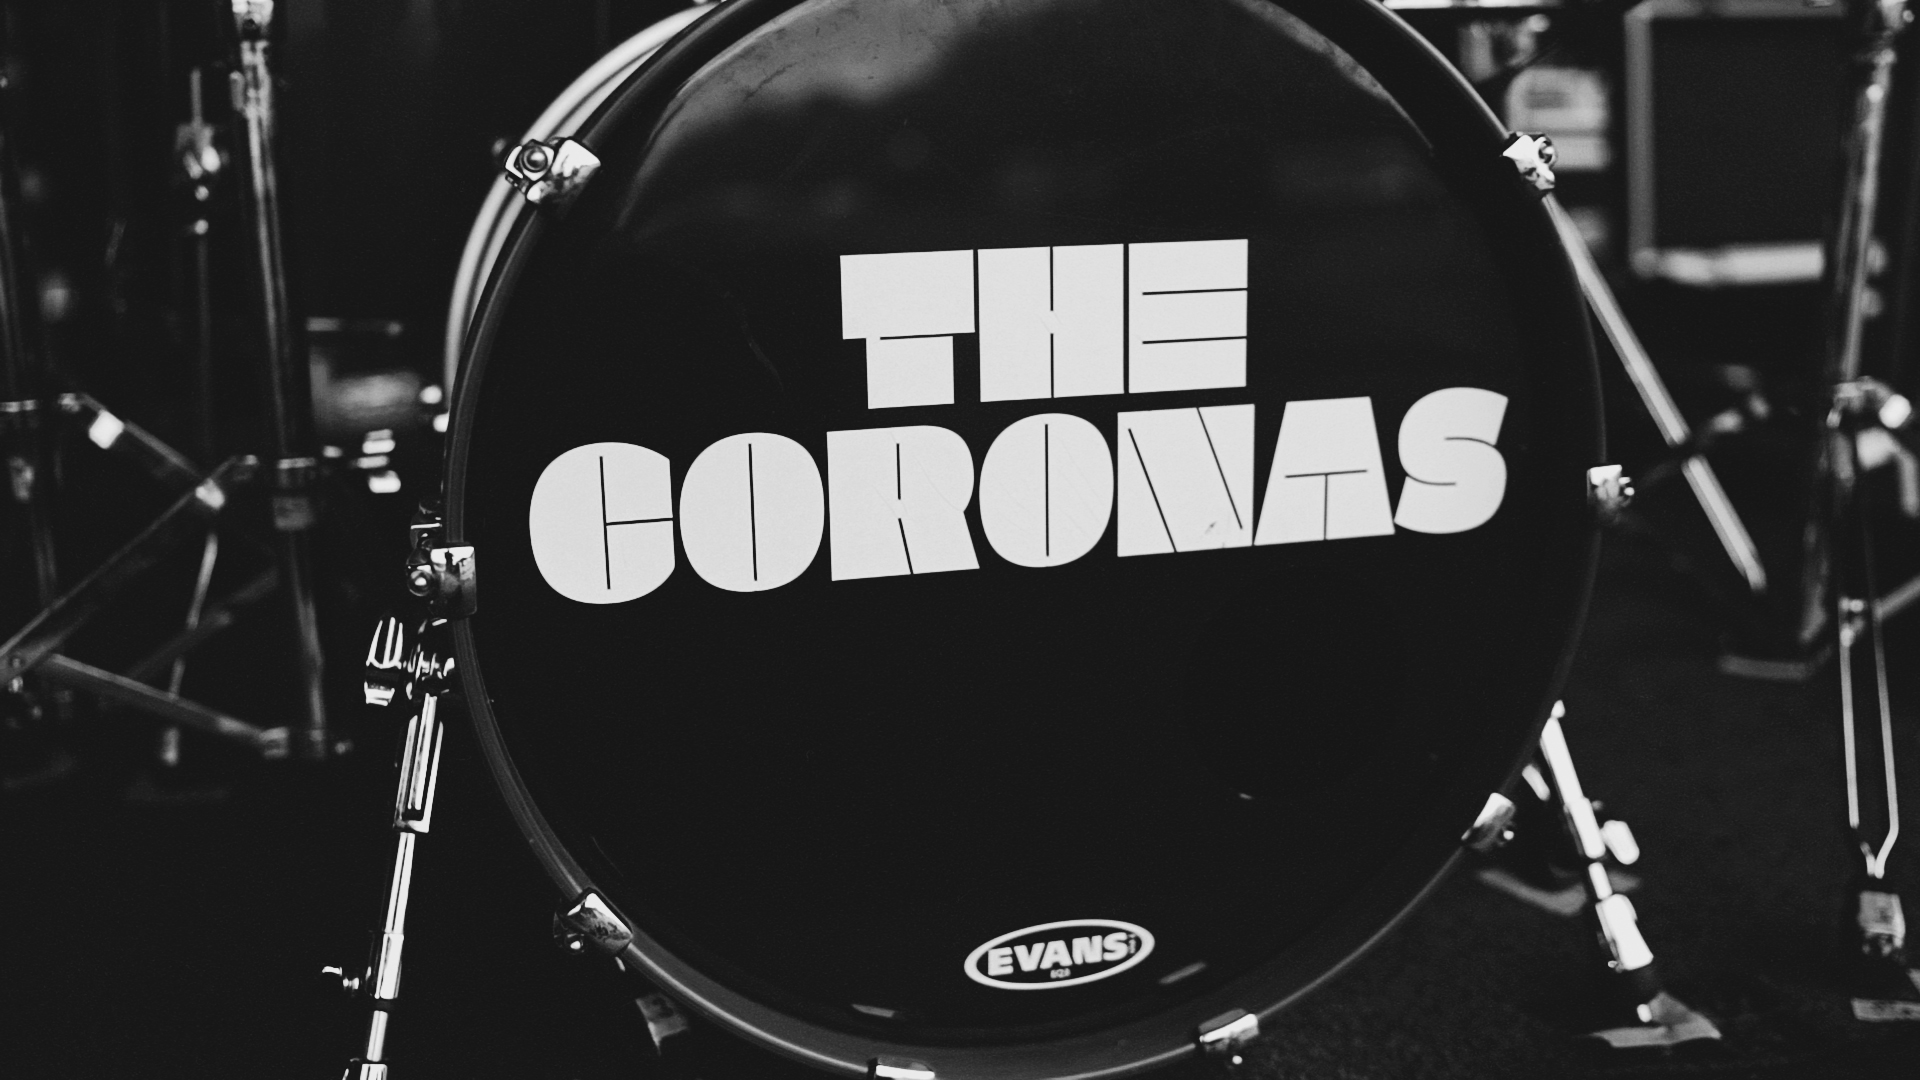 Coronas_67.jpg